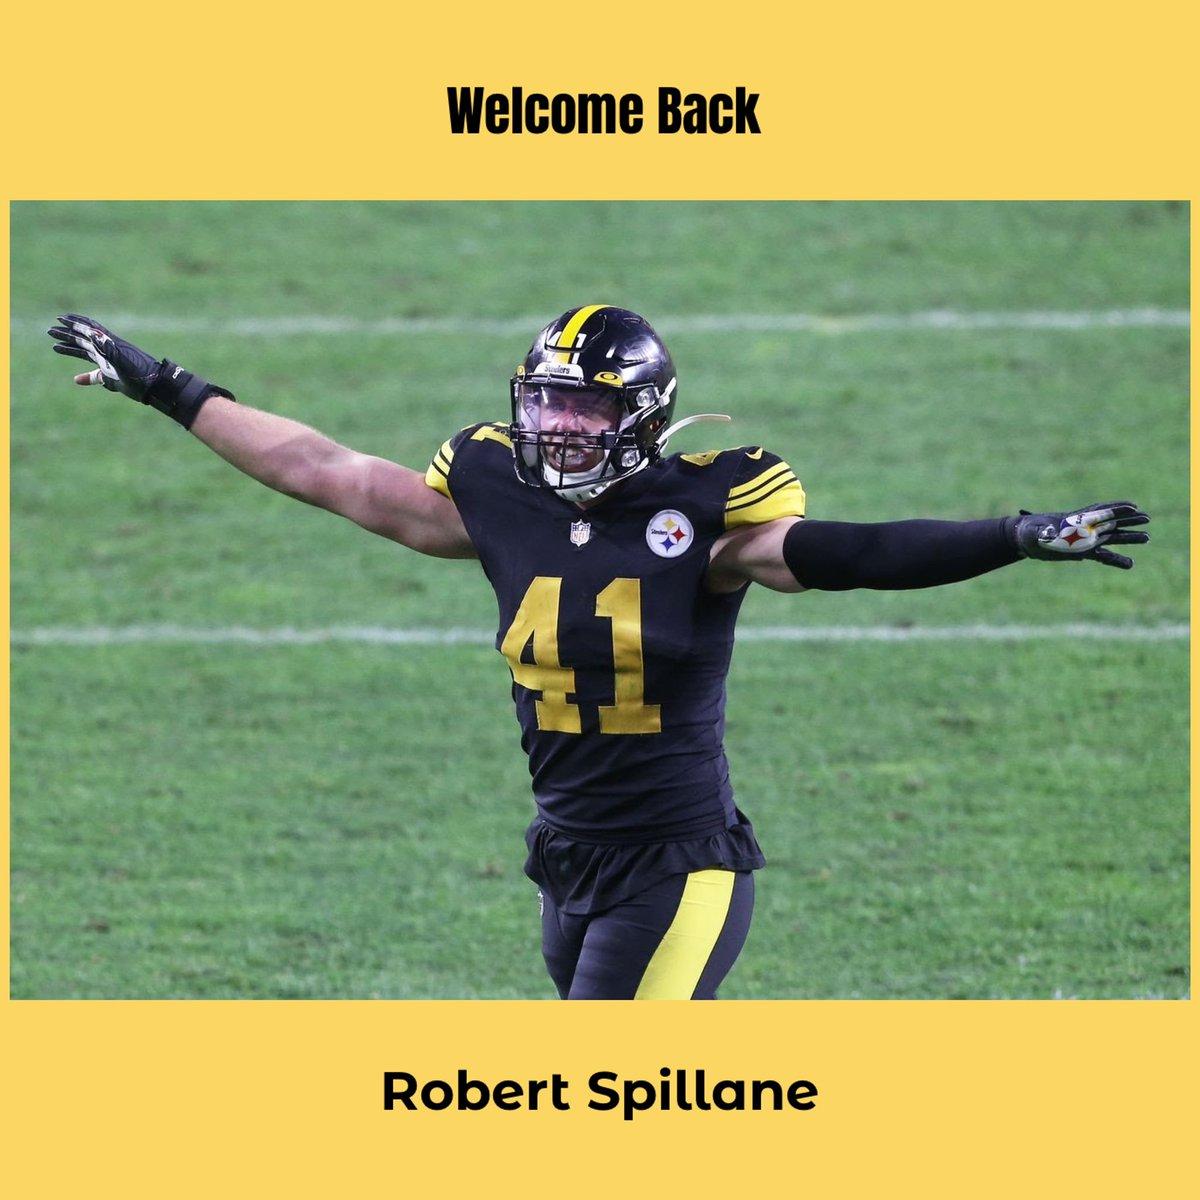 Welcome back Robert Spillane💪🏼 Here We Go Steelers ✨#HereWeGo #Steelers